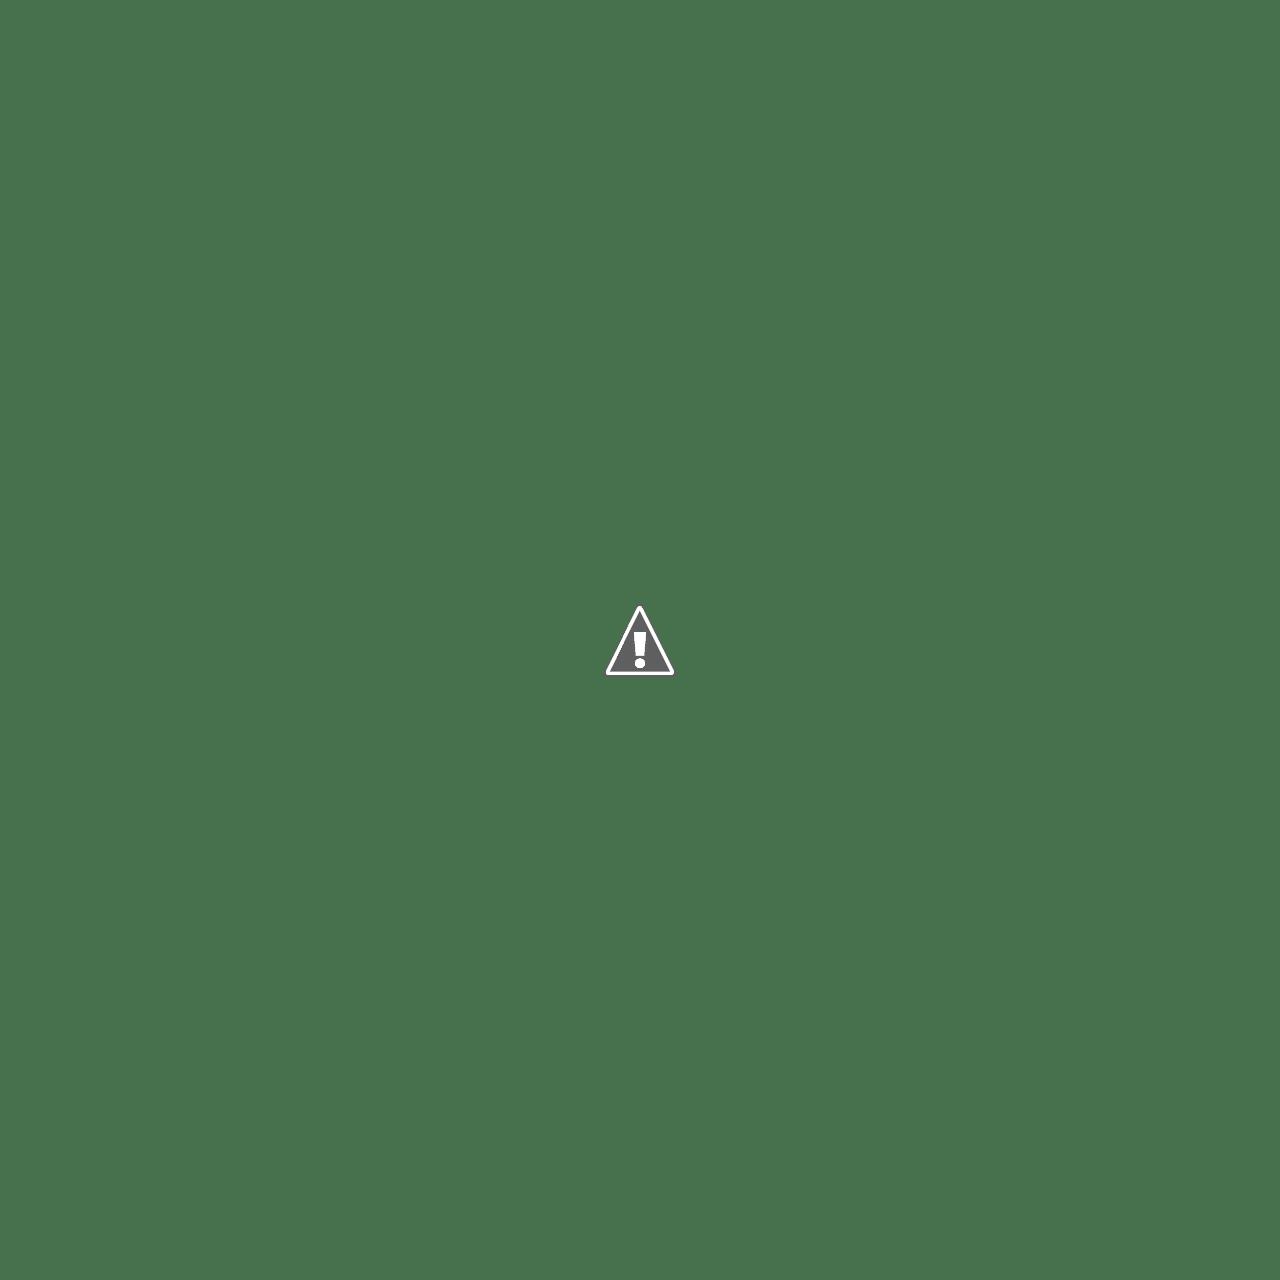 Cynsational Massage - Licensed Massage Therapist in Katy